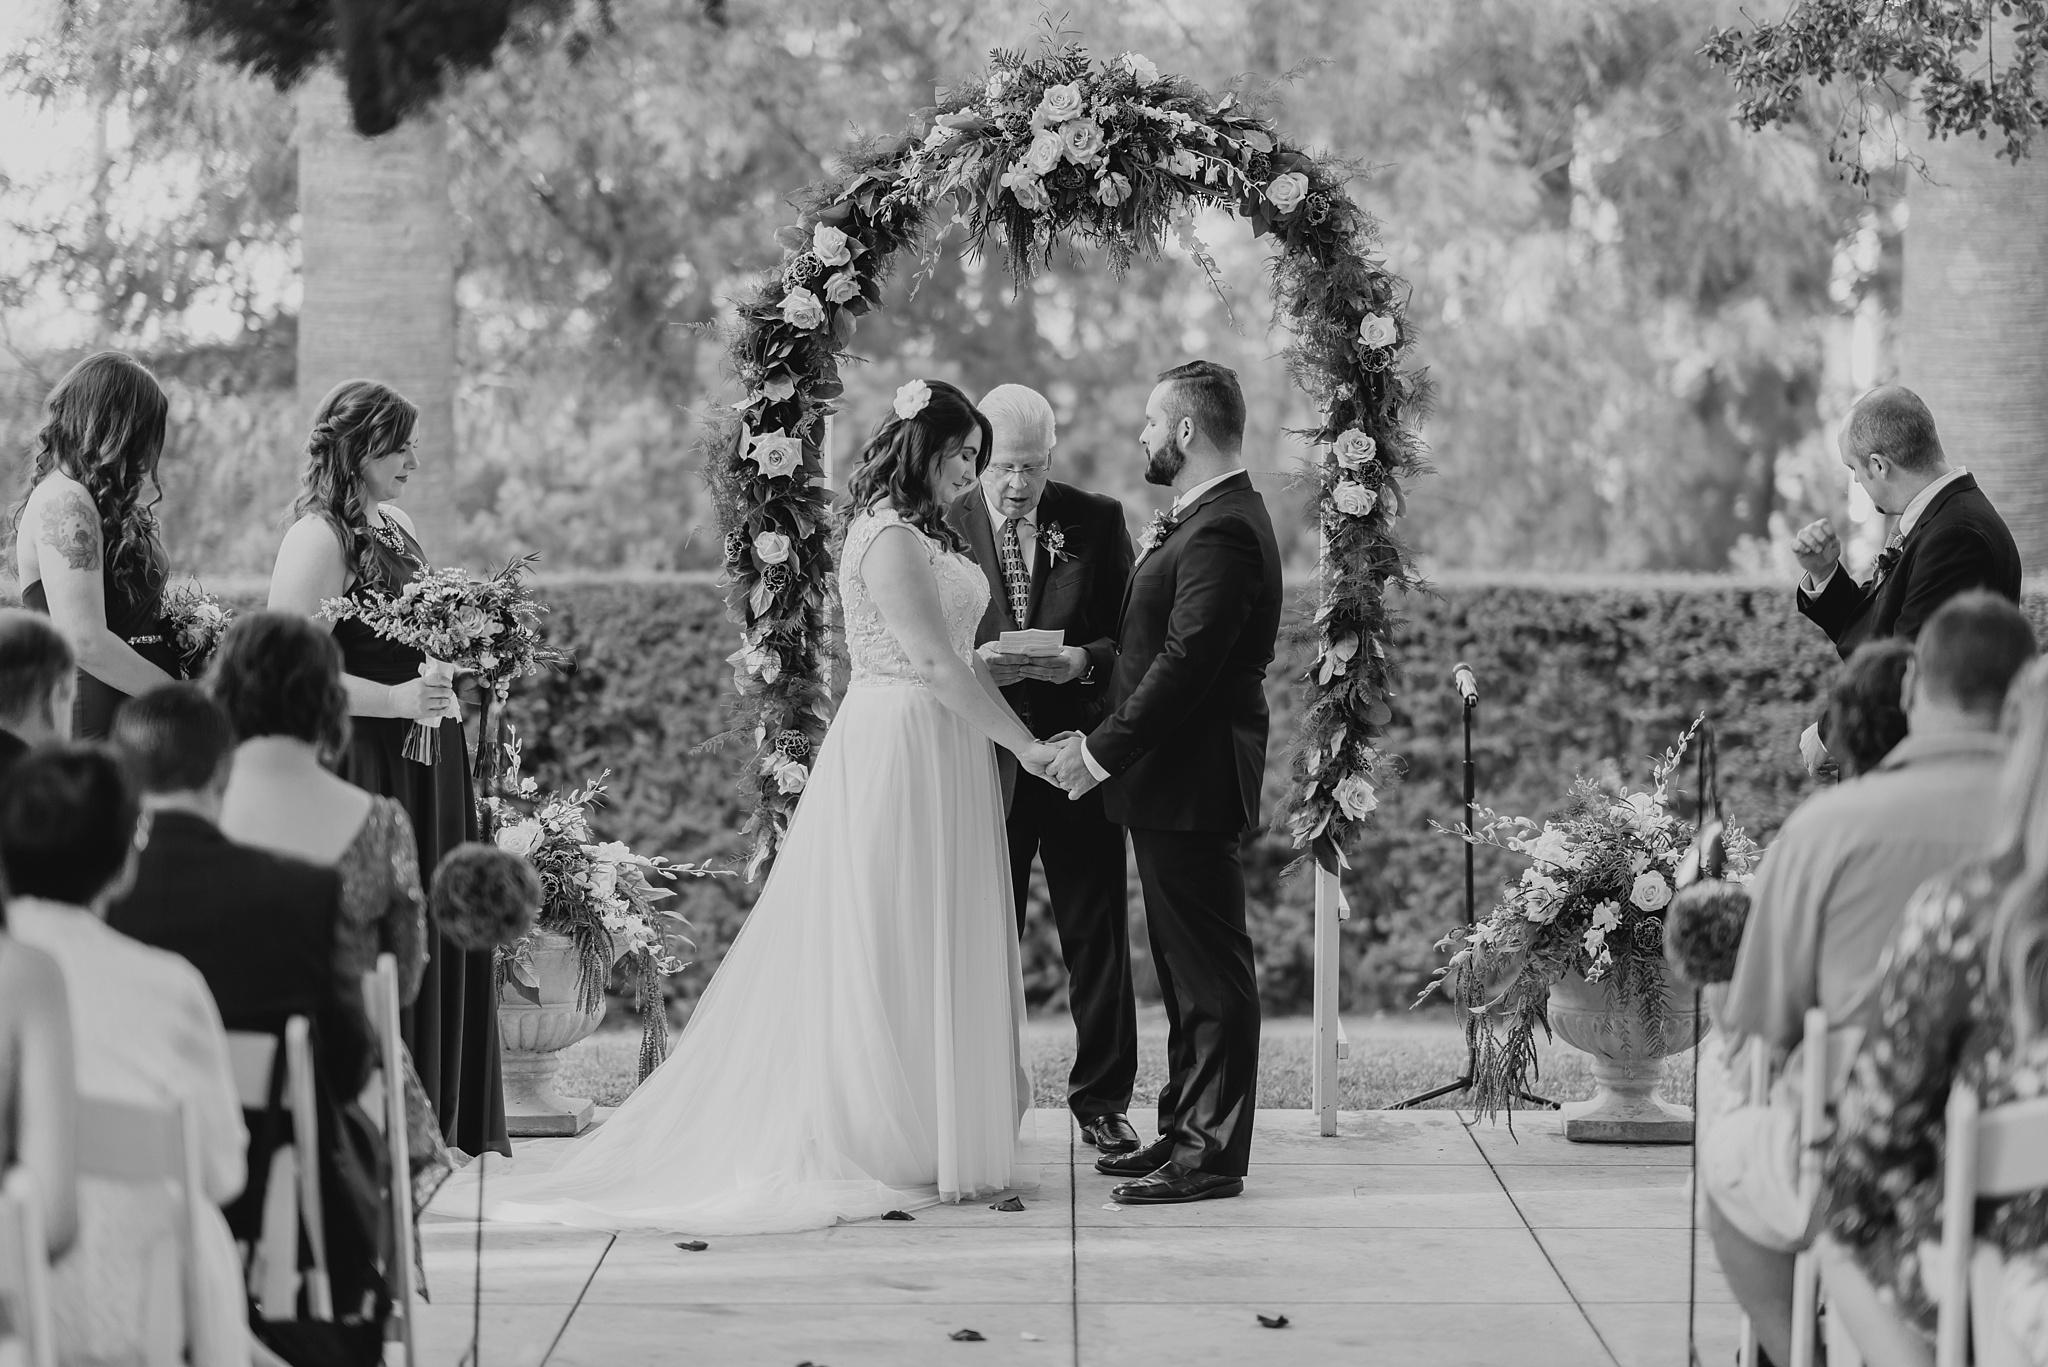 TommyandAmanda_WEDDING_BrienneMichelle_Ceremony_045_BLOG.jpg